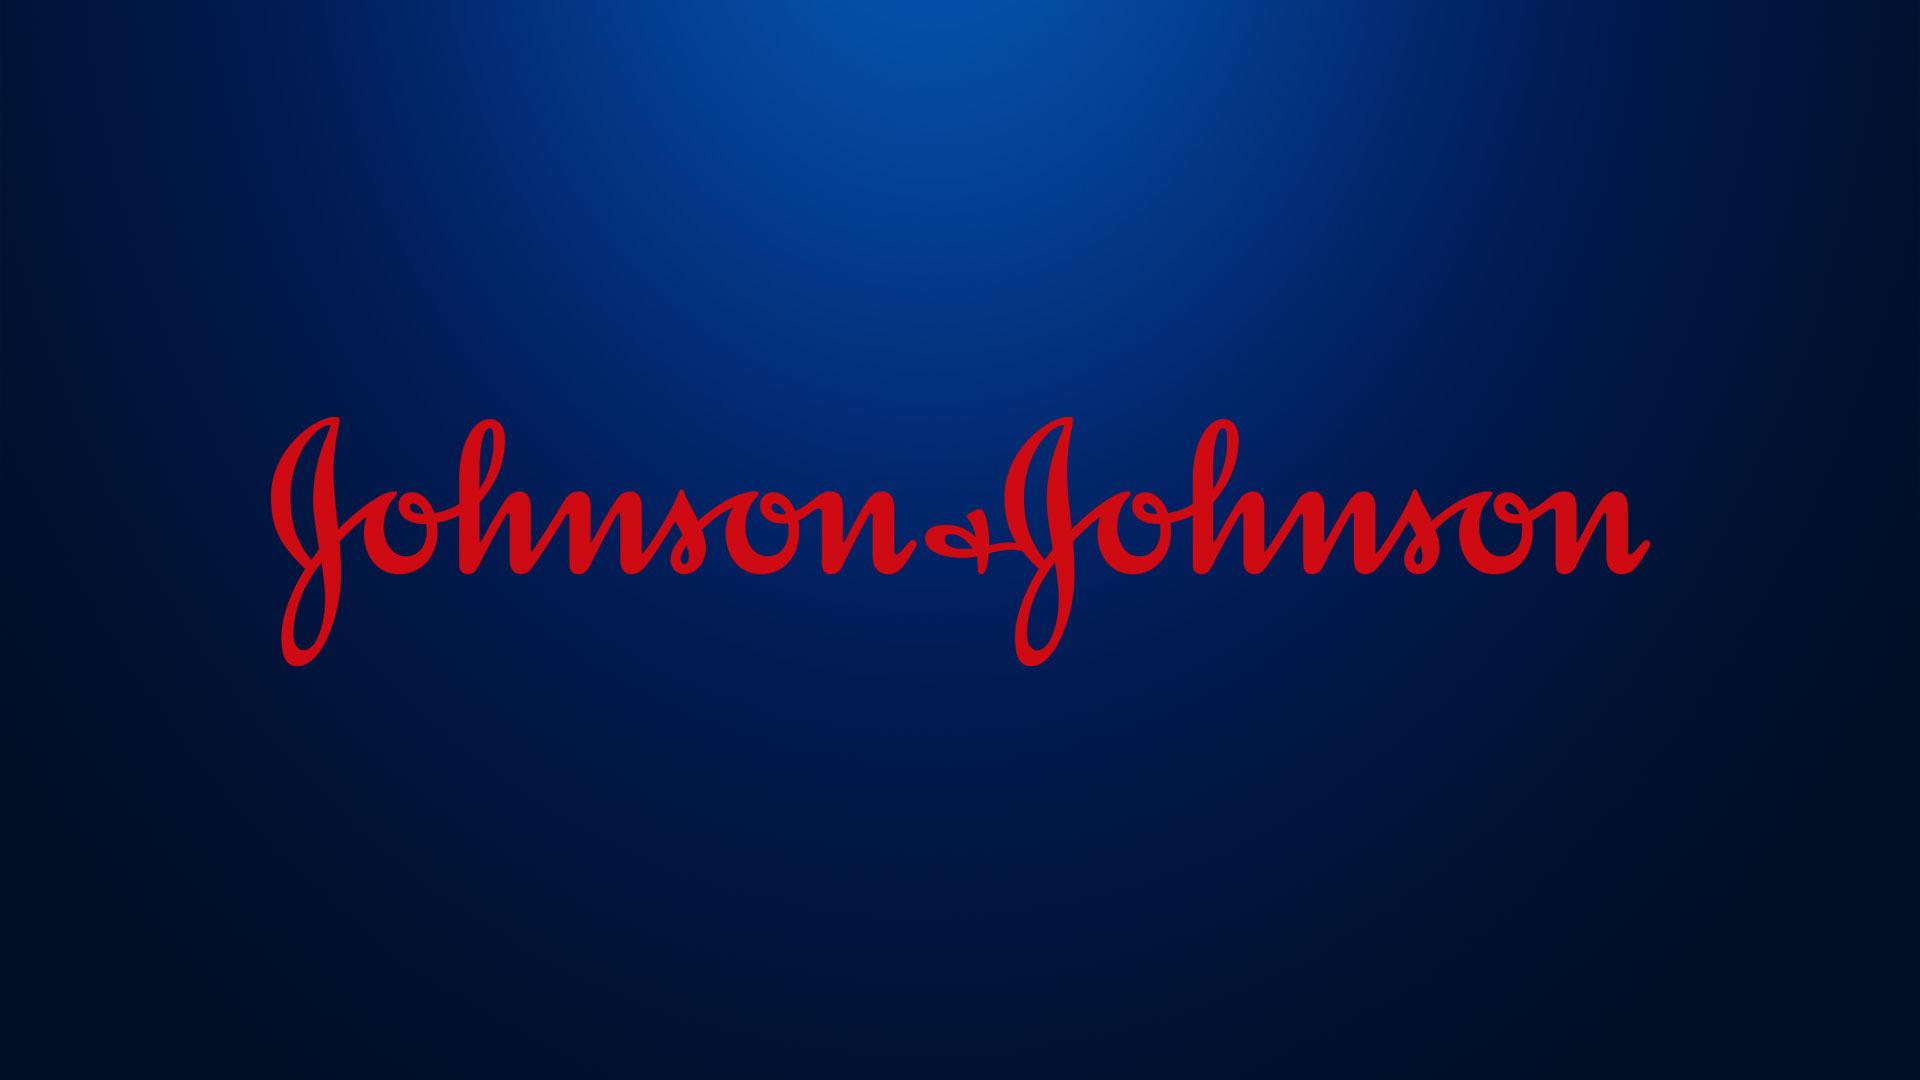 KELO Johnson & Johnson